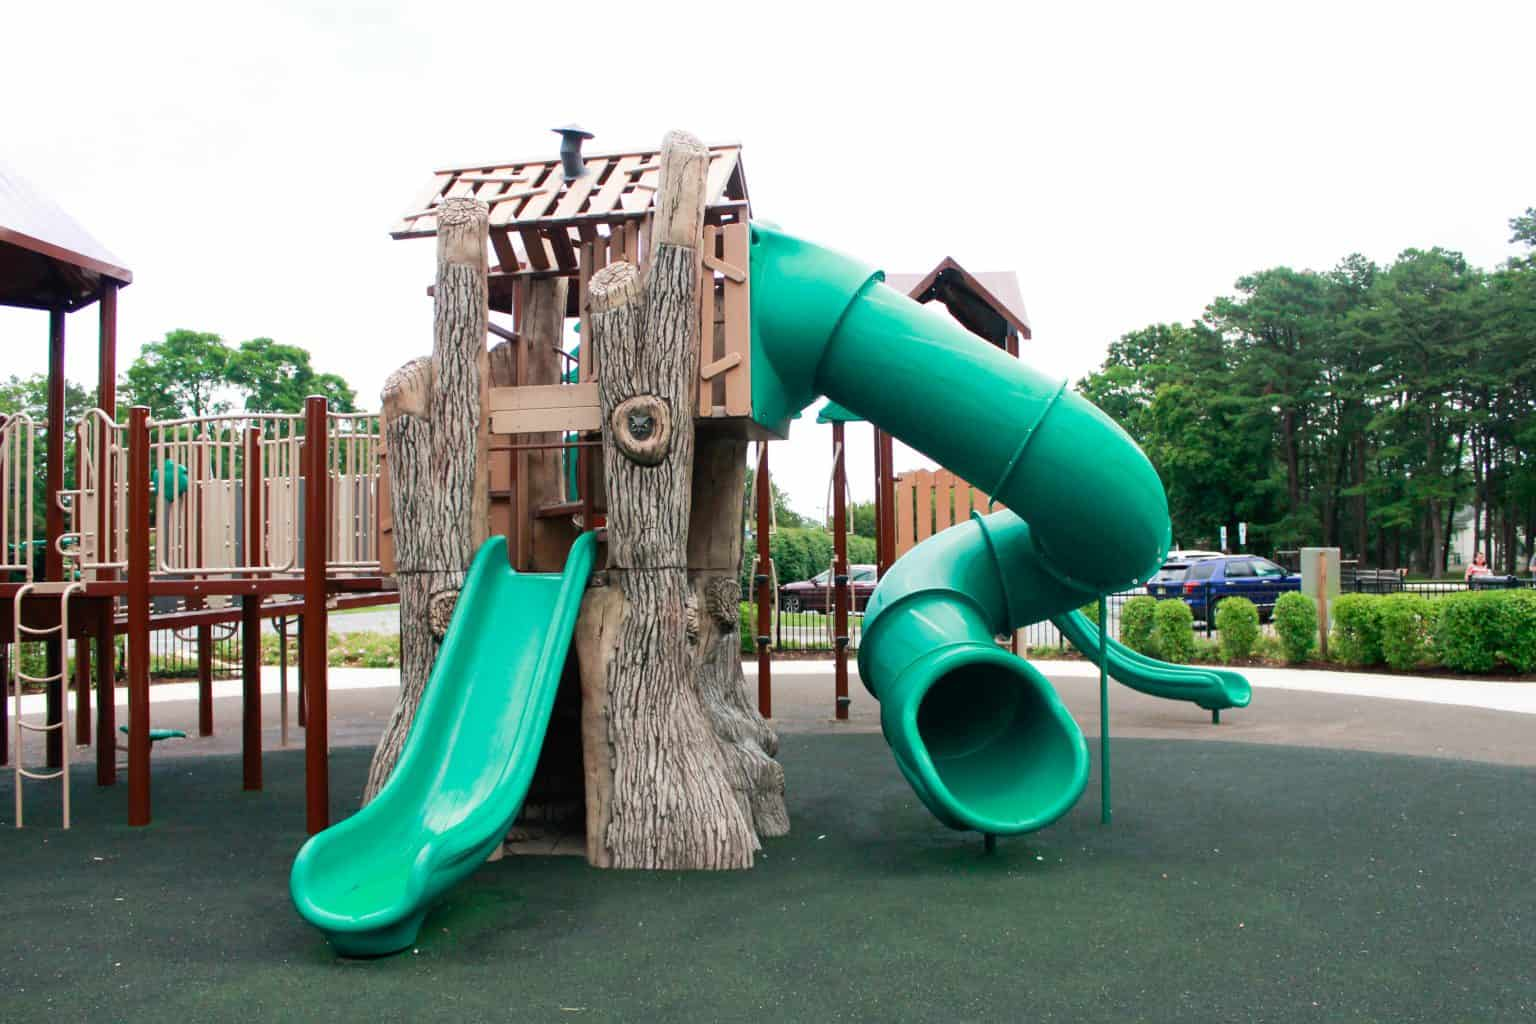 windward-beach-park-playground-brick-nj_27651421563_o-1536x1024